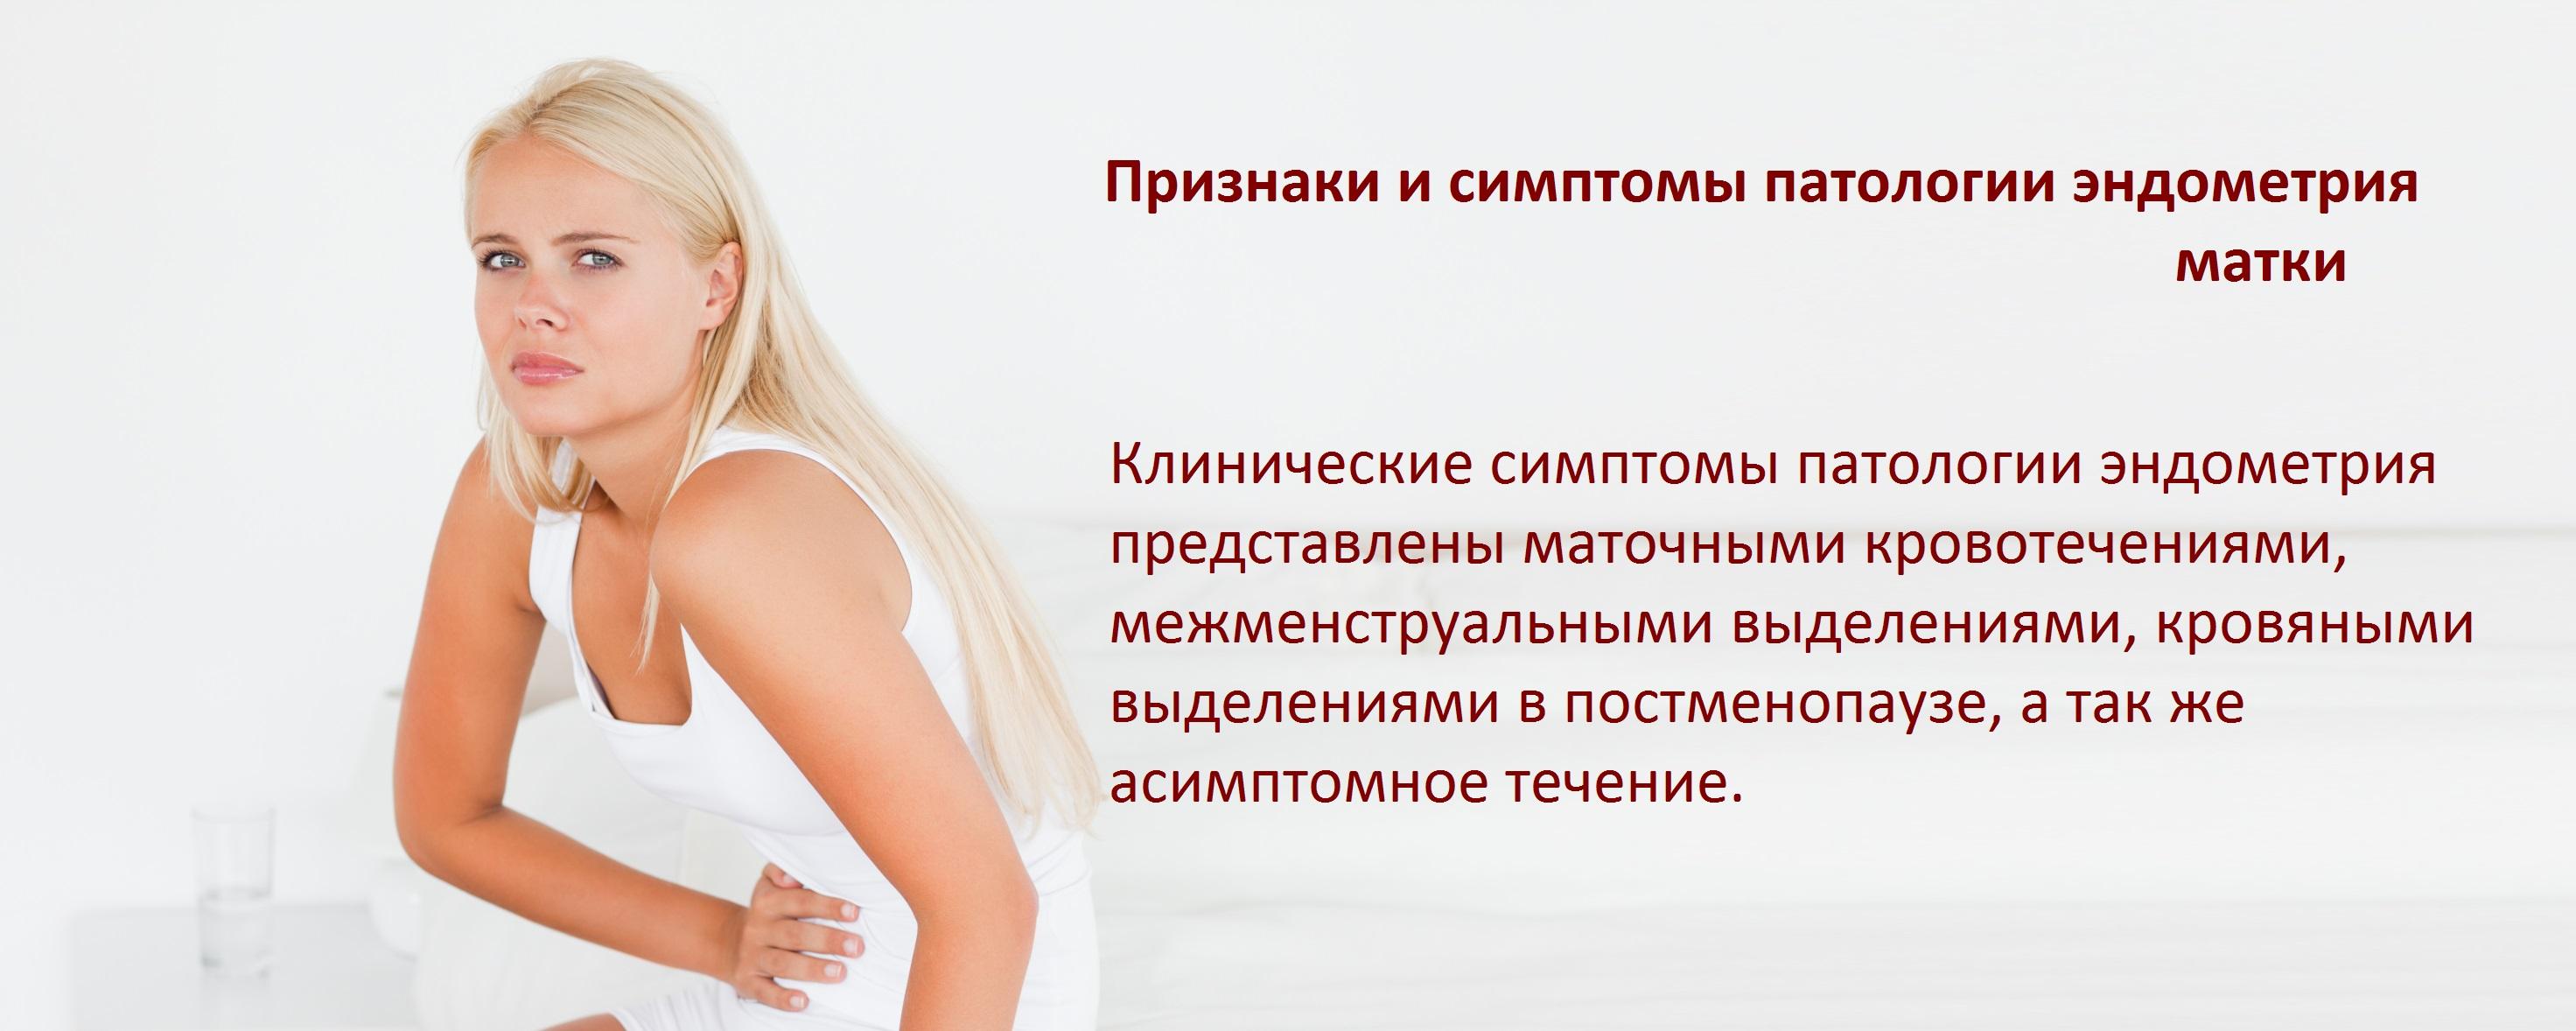 Лечение патологии эндометрия матки